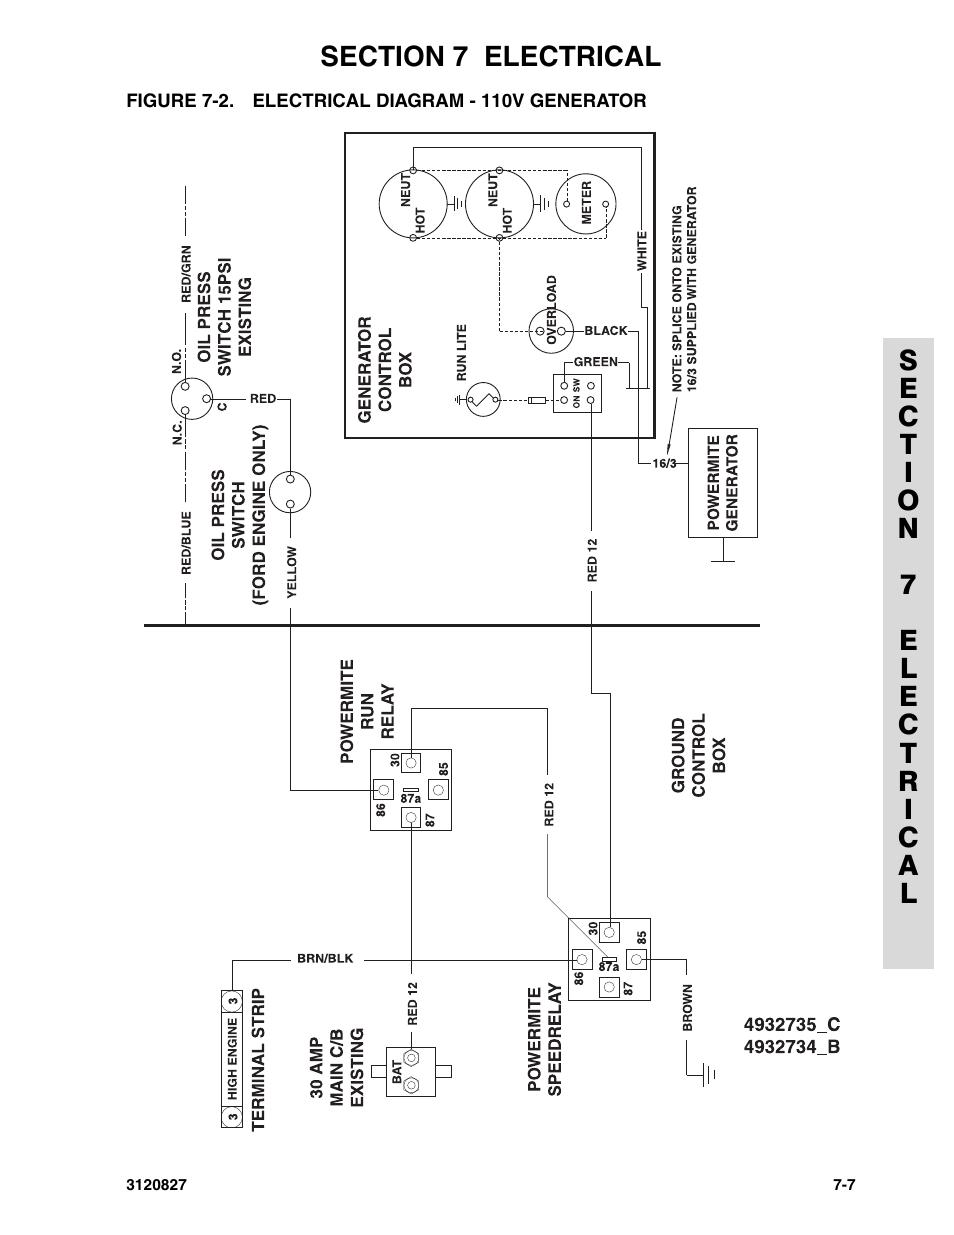 jlg 20mvl wiring diagram wiring diagram basic jlg 20mvl wiring schematics data diagram schematicjlg 20mvl wiring diagram 21